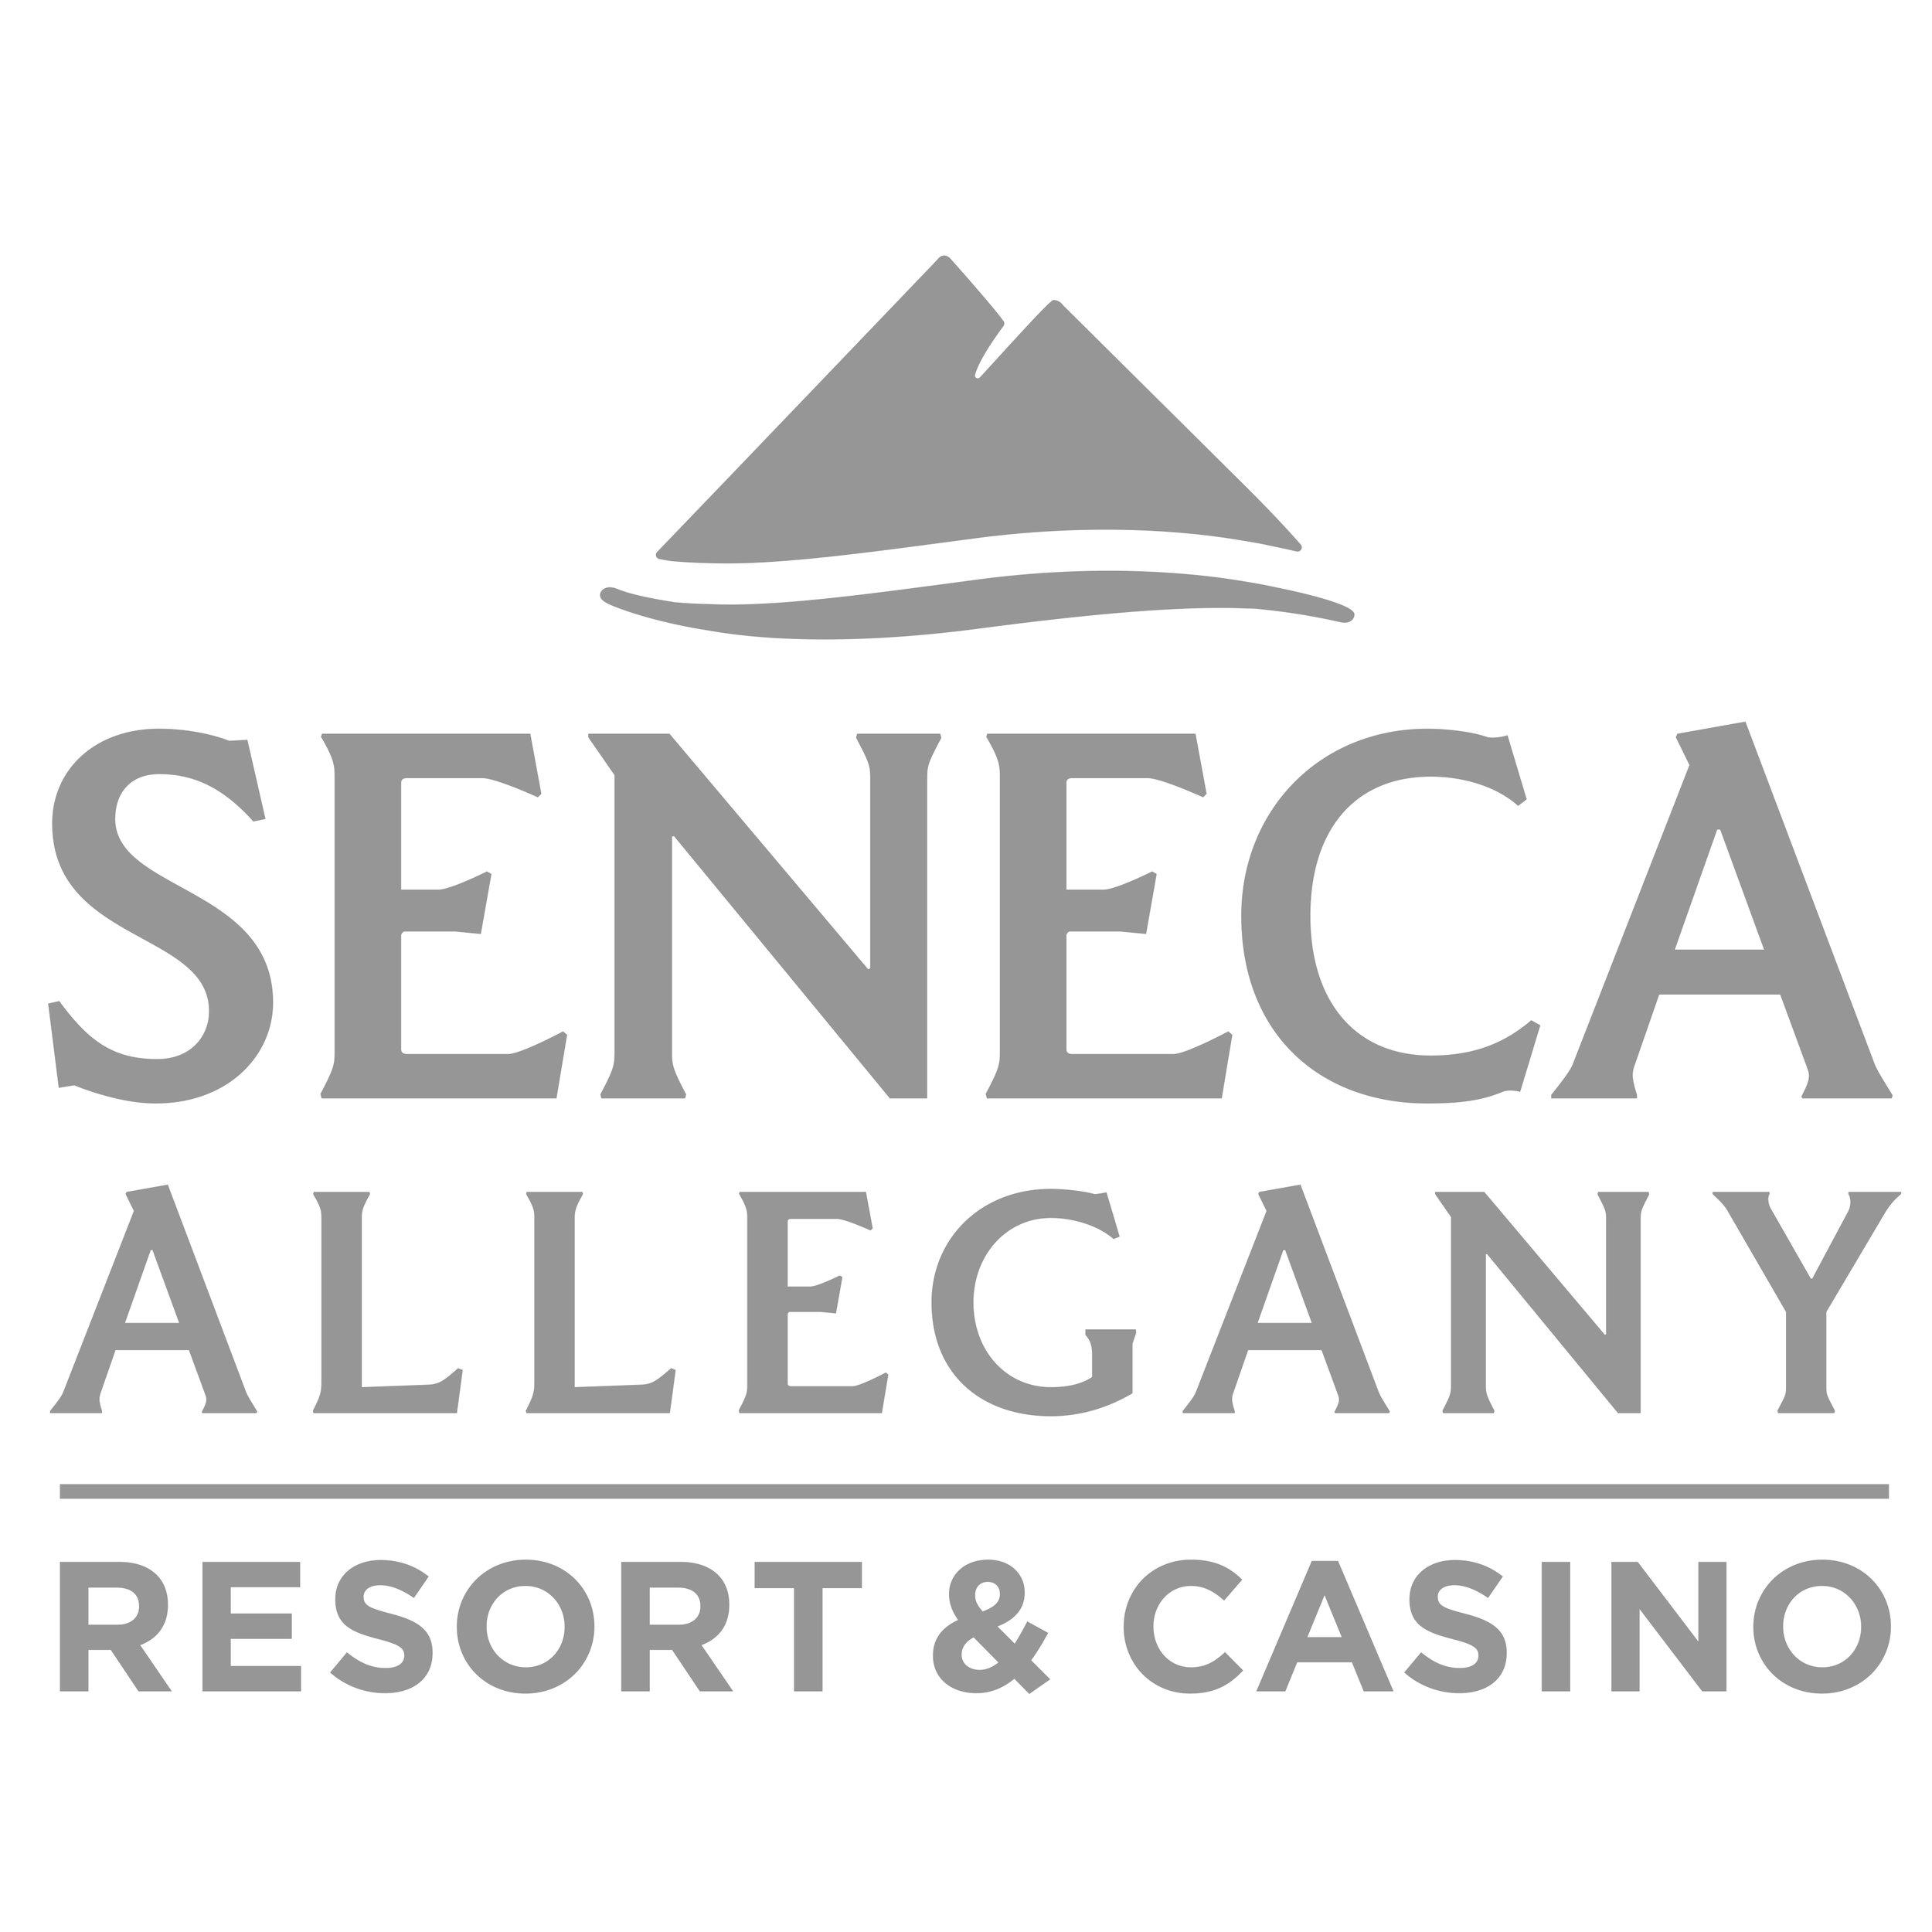 Seneca Allegany EDITED.jpg